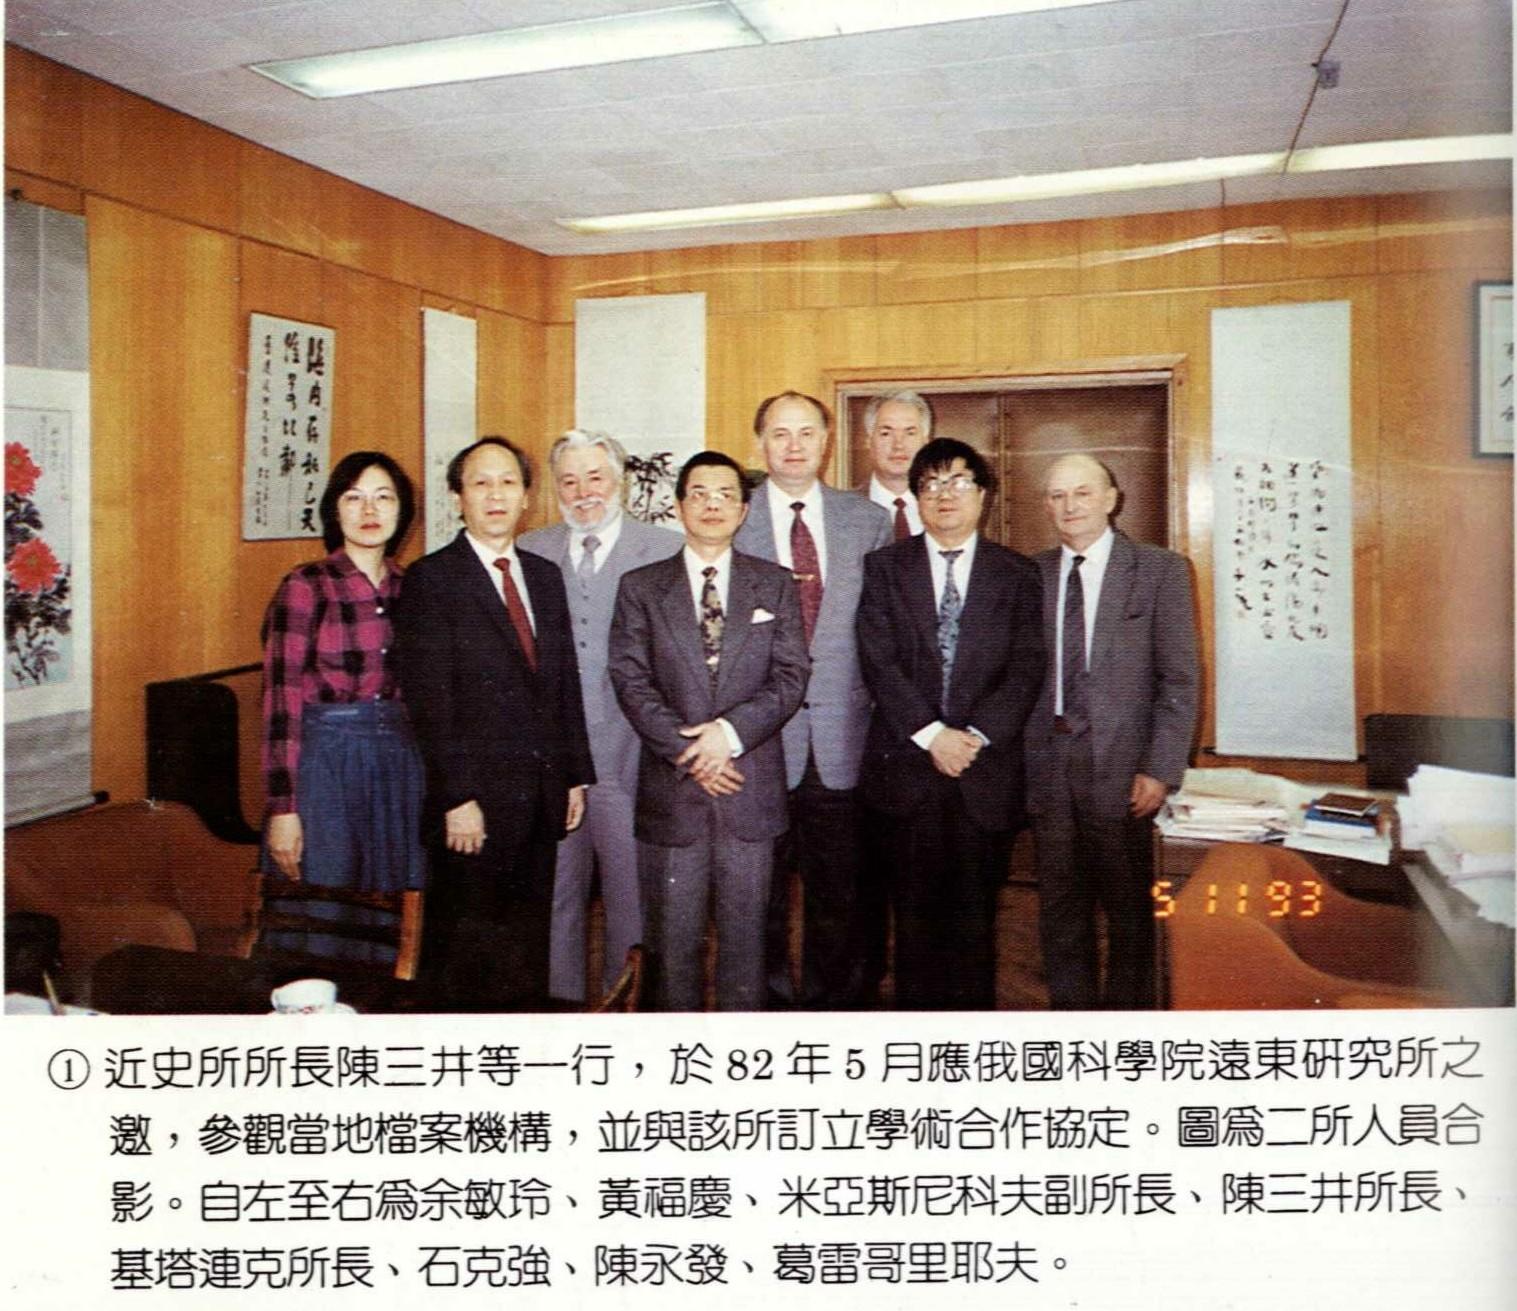 1993moscow00101.jpg